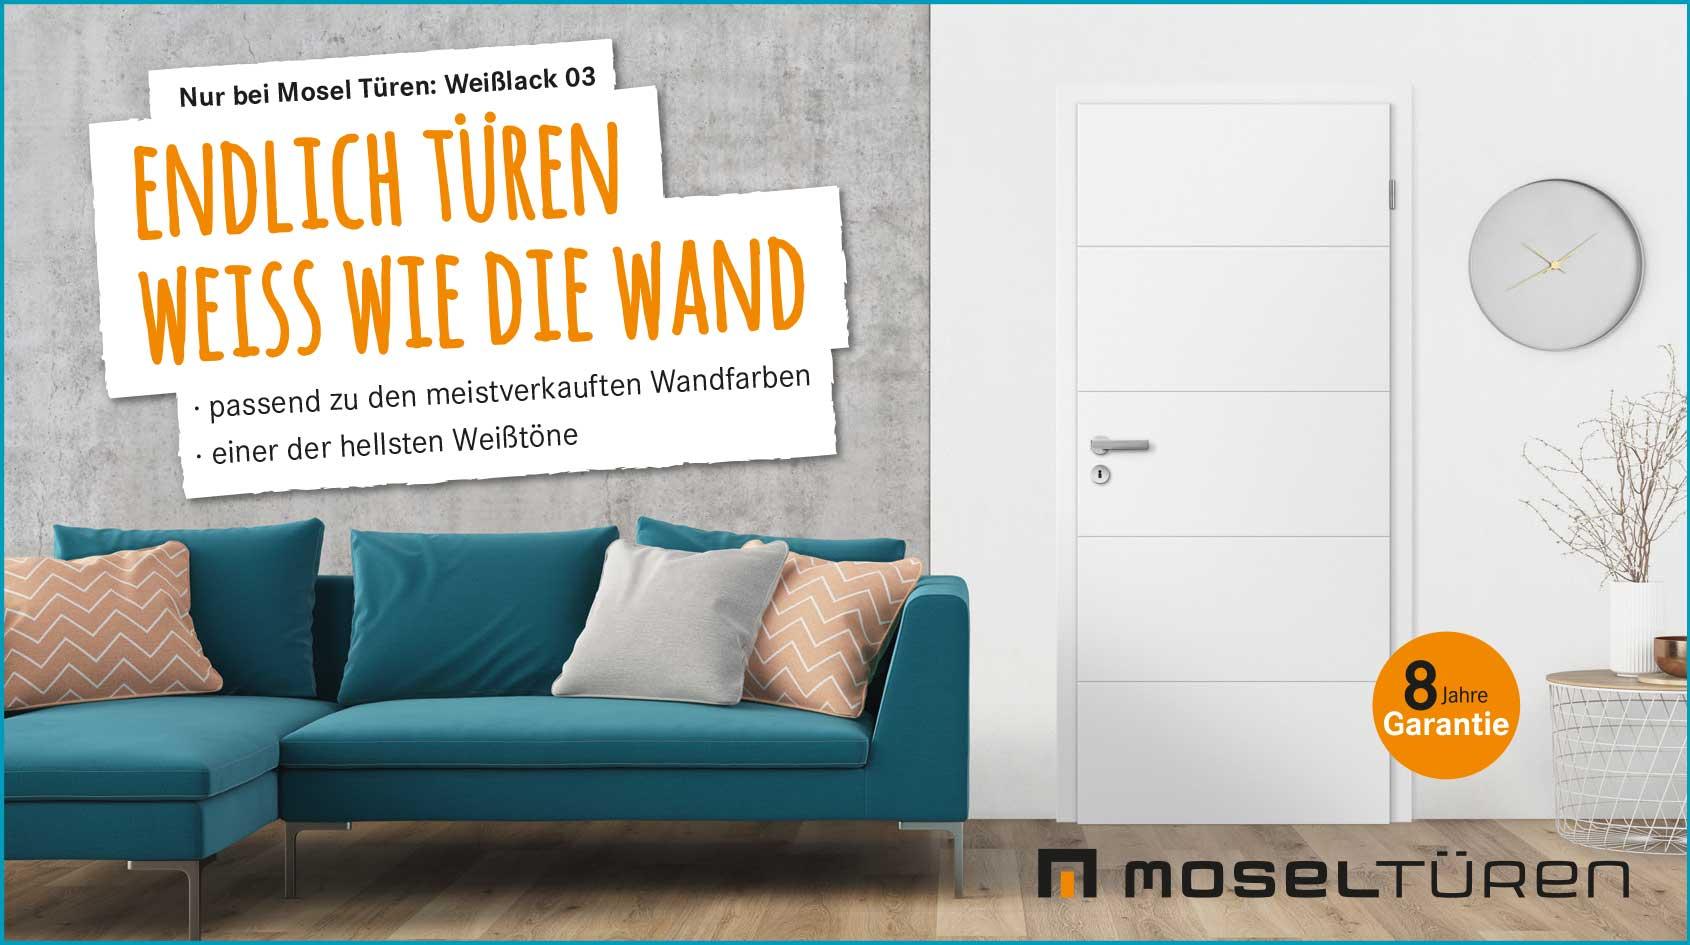 Mosel Türen – Weiss wie die Wand